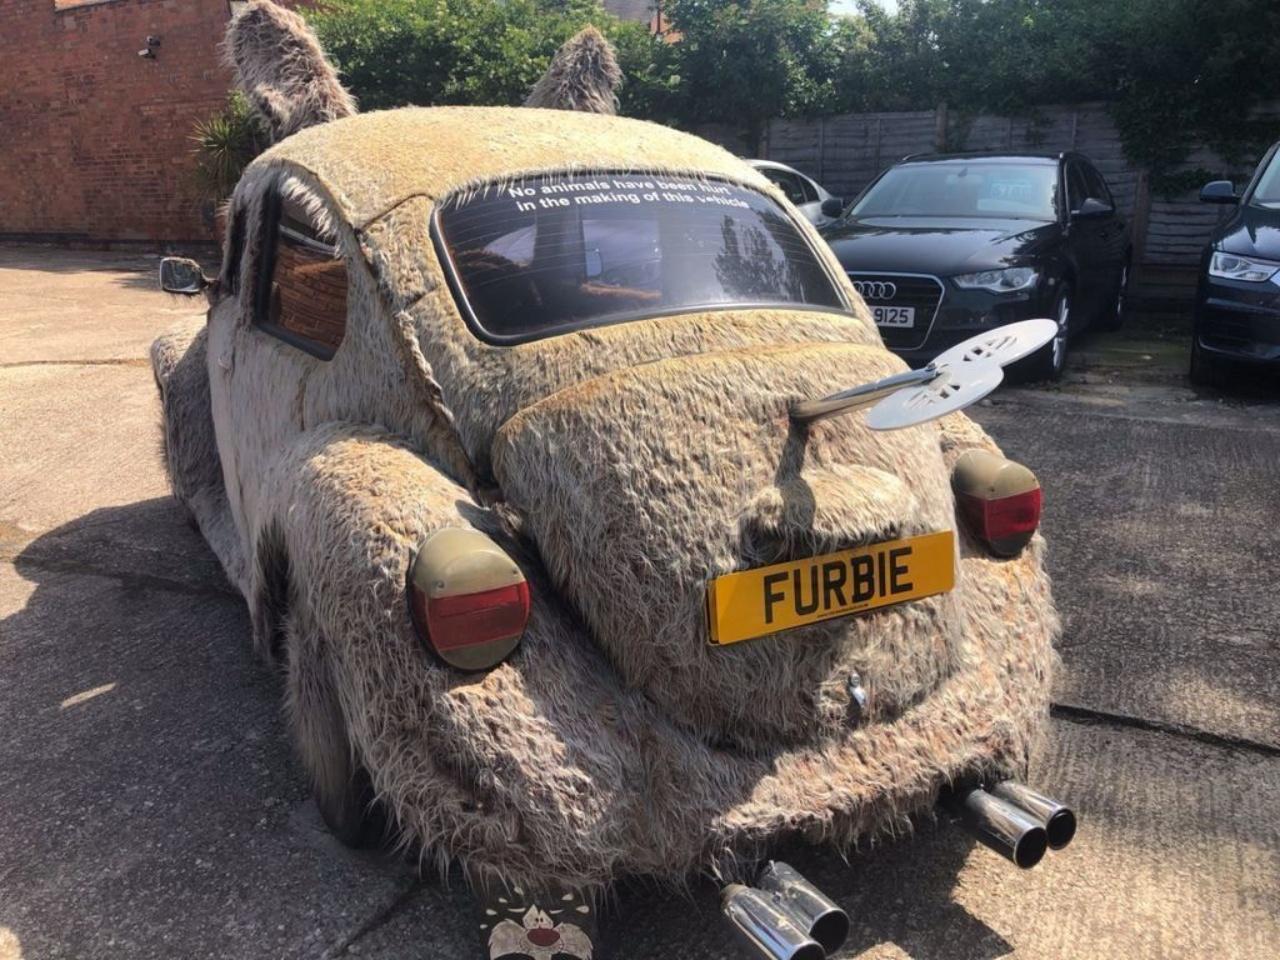 Volkswagen-Beetle-Furbie-1978-1